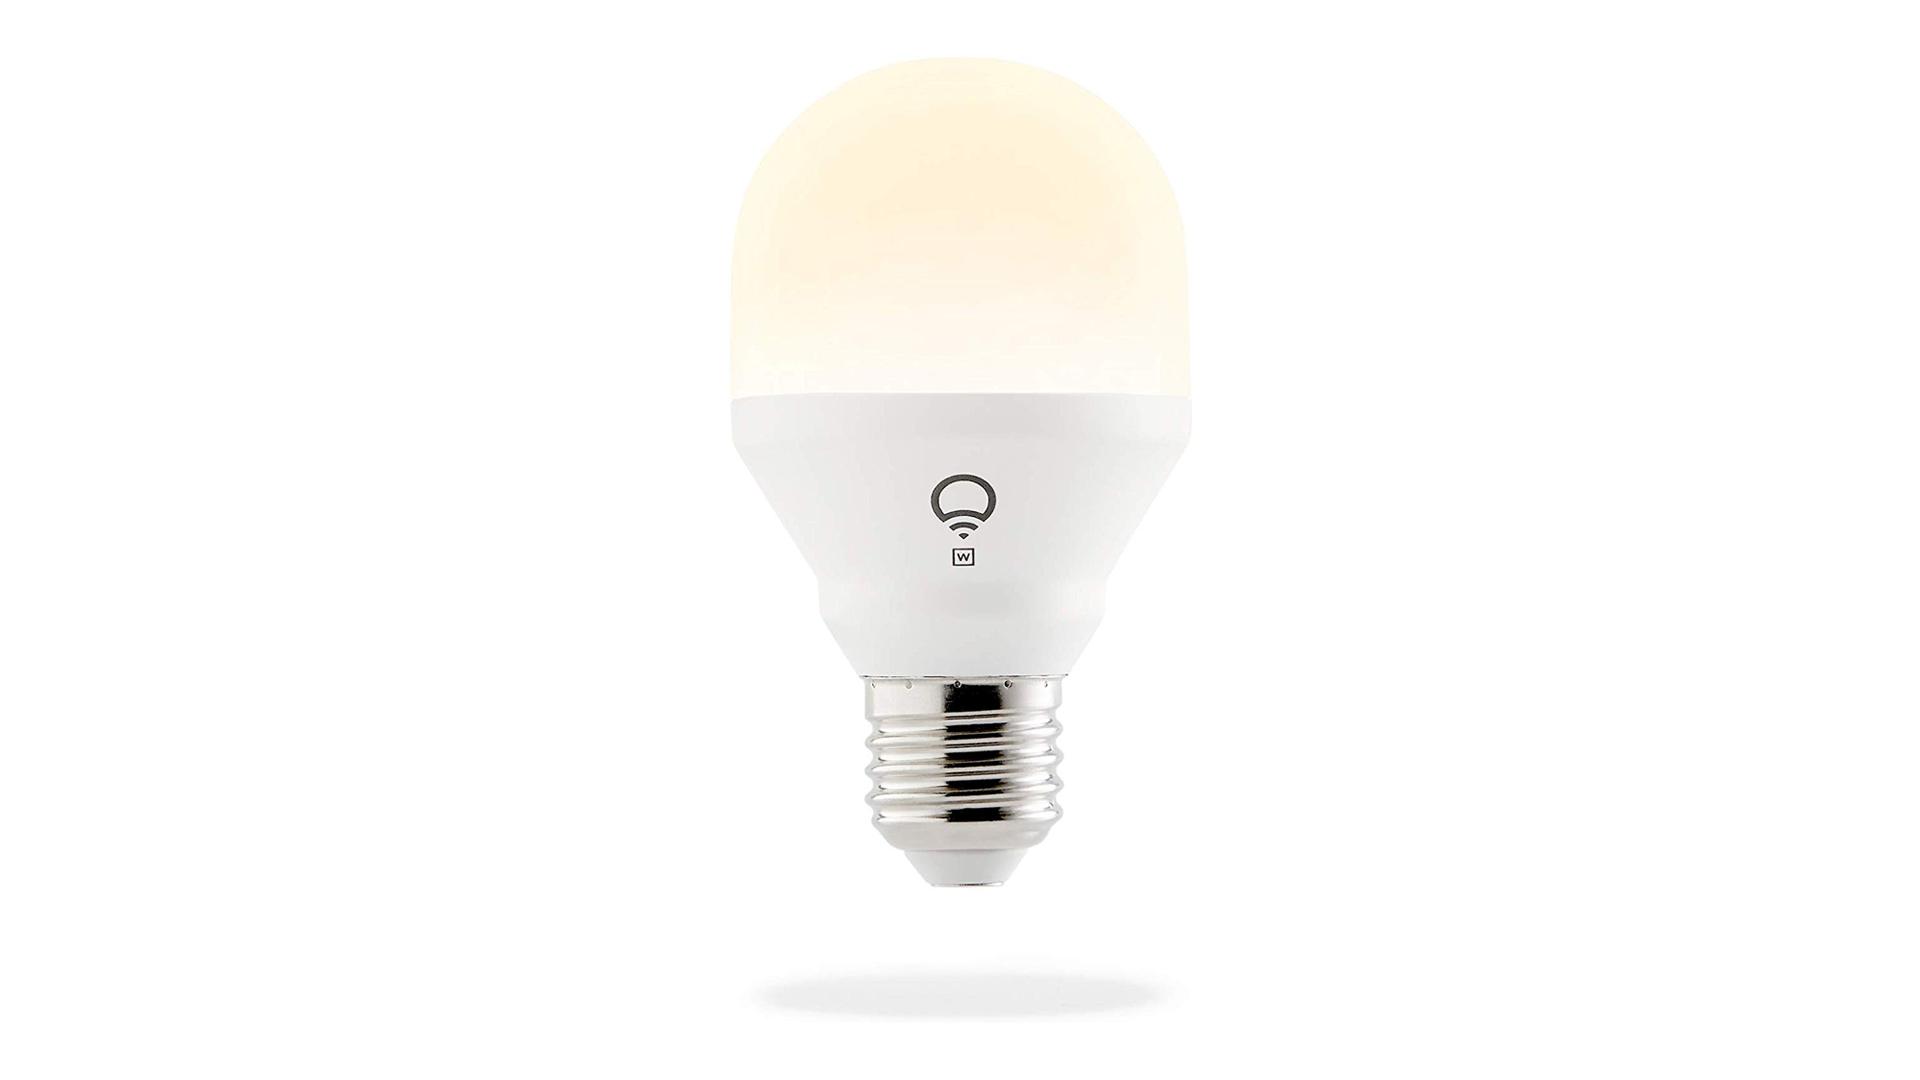 A LIFX A19 smart bulb.